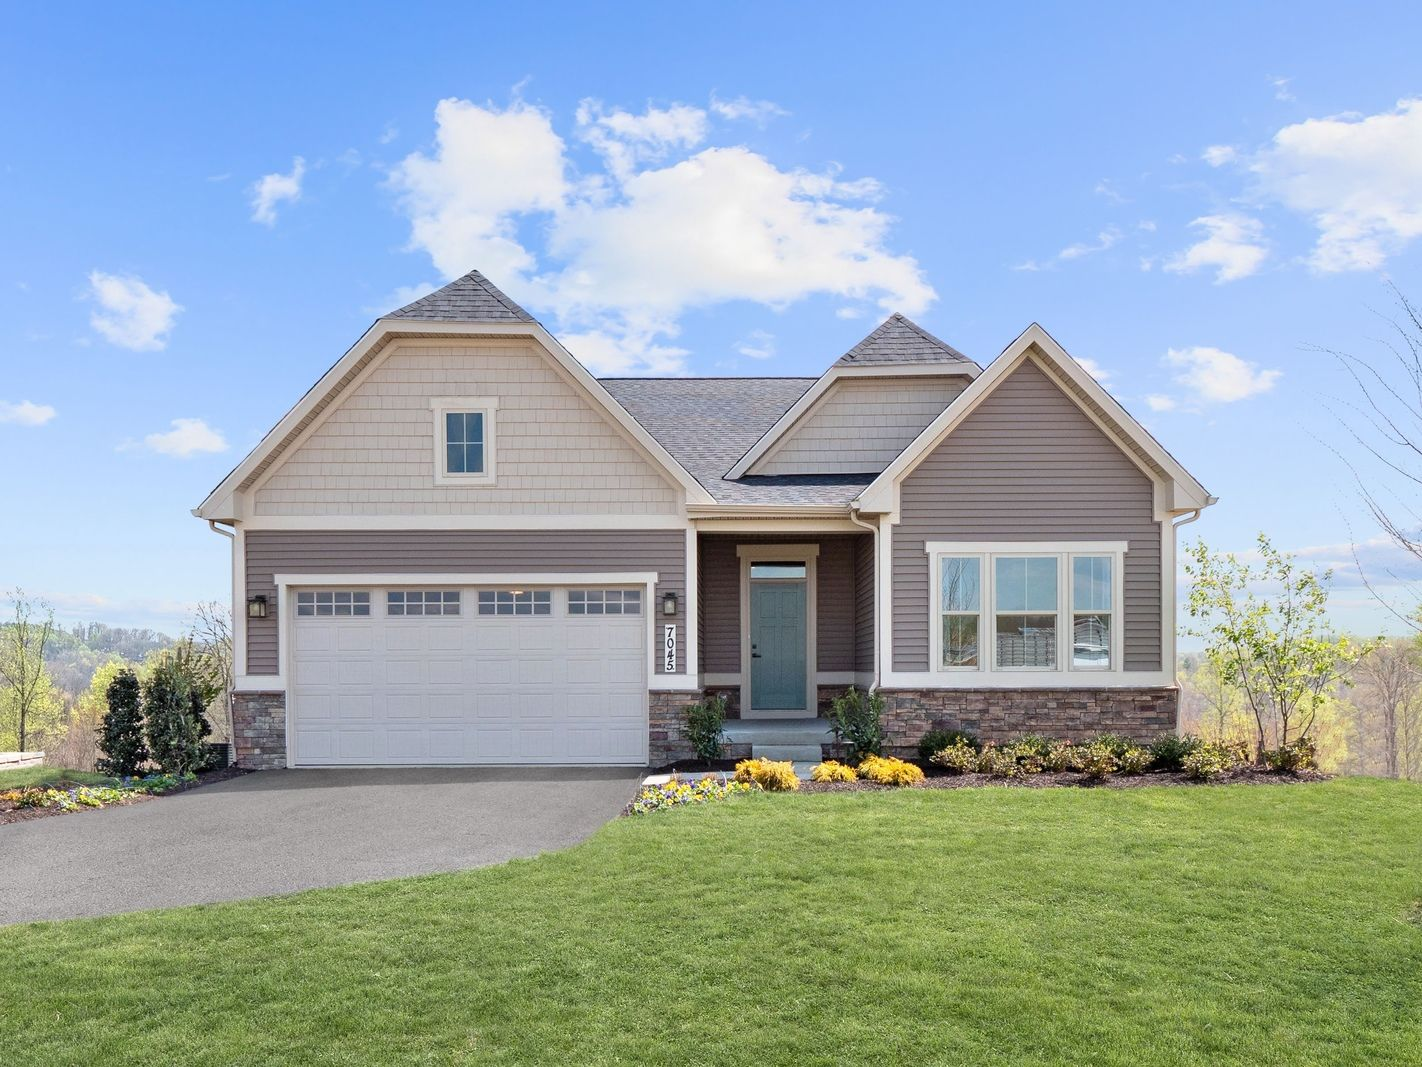 Unifamiliar por un Venta en Lake Linganore Hamptons Single Family Homes - Bramante Ranch 7047 Eaglehead Drive New Market, Maryland 21774 United States